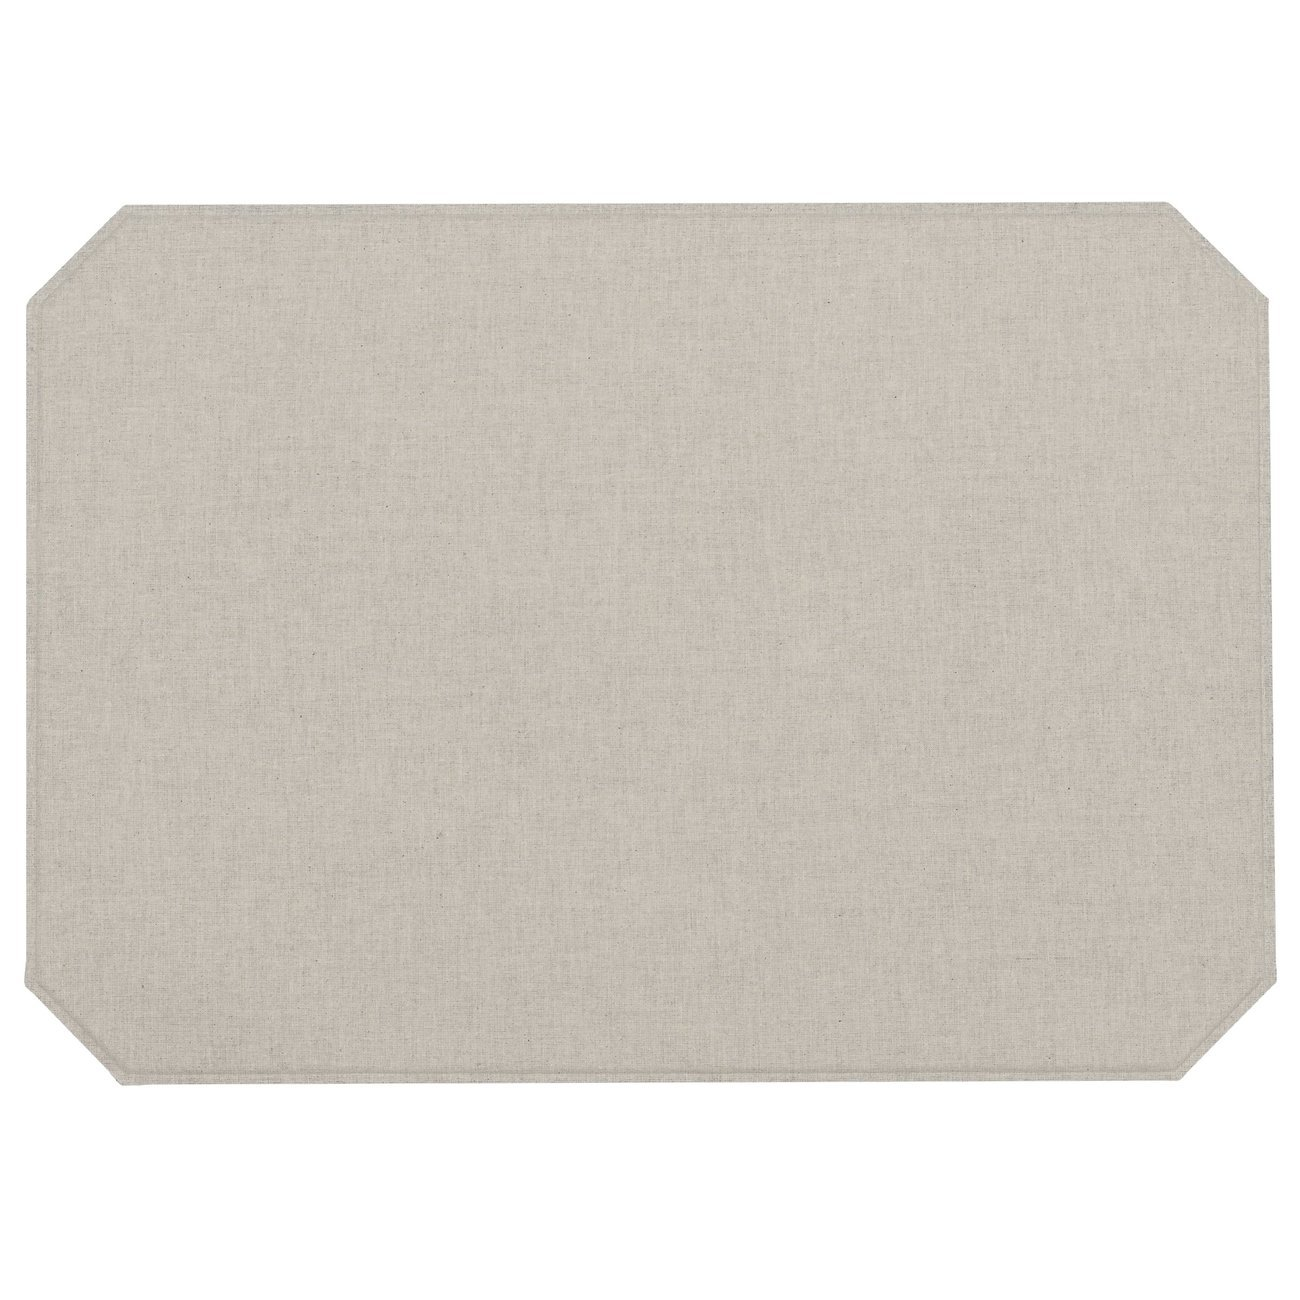 4pets Ersatz Bodenmatte für Hundebox ECO, Bodenmatte für ECO 2 M H0,2xB72,5xT44cm